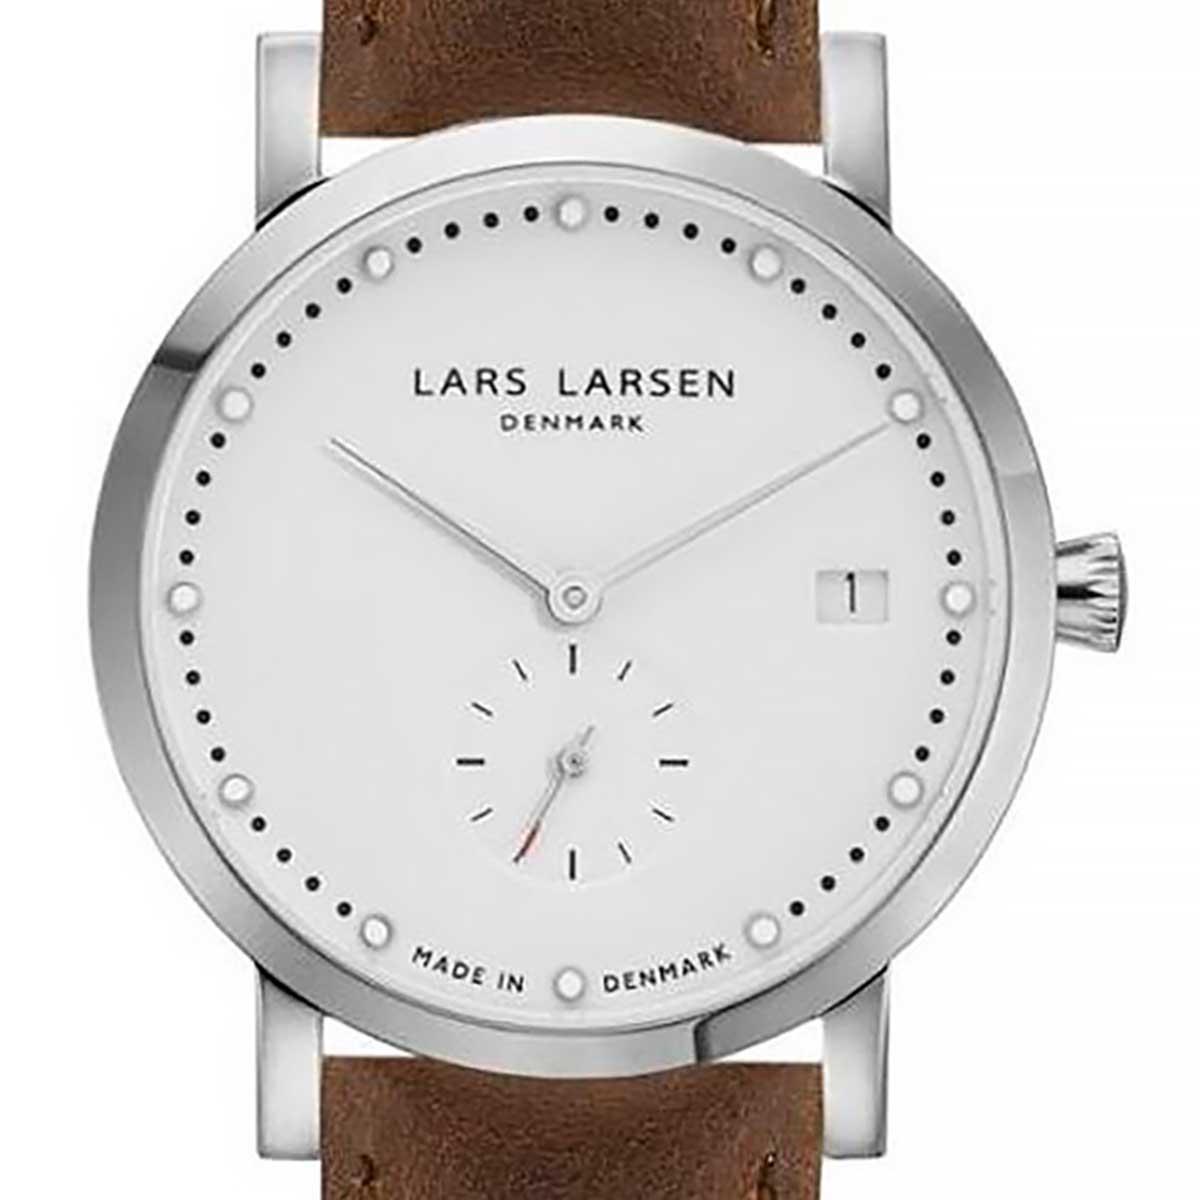 LARS LARSEN ラースラーセン (LLARSEN エルラーセン) 電池式クォーツ 腕時計 [WH137SW-BS18] 並行輸入品